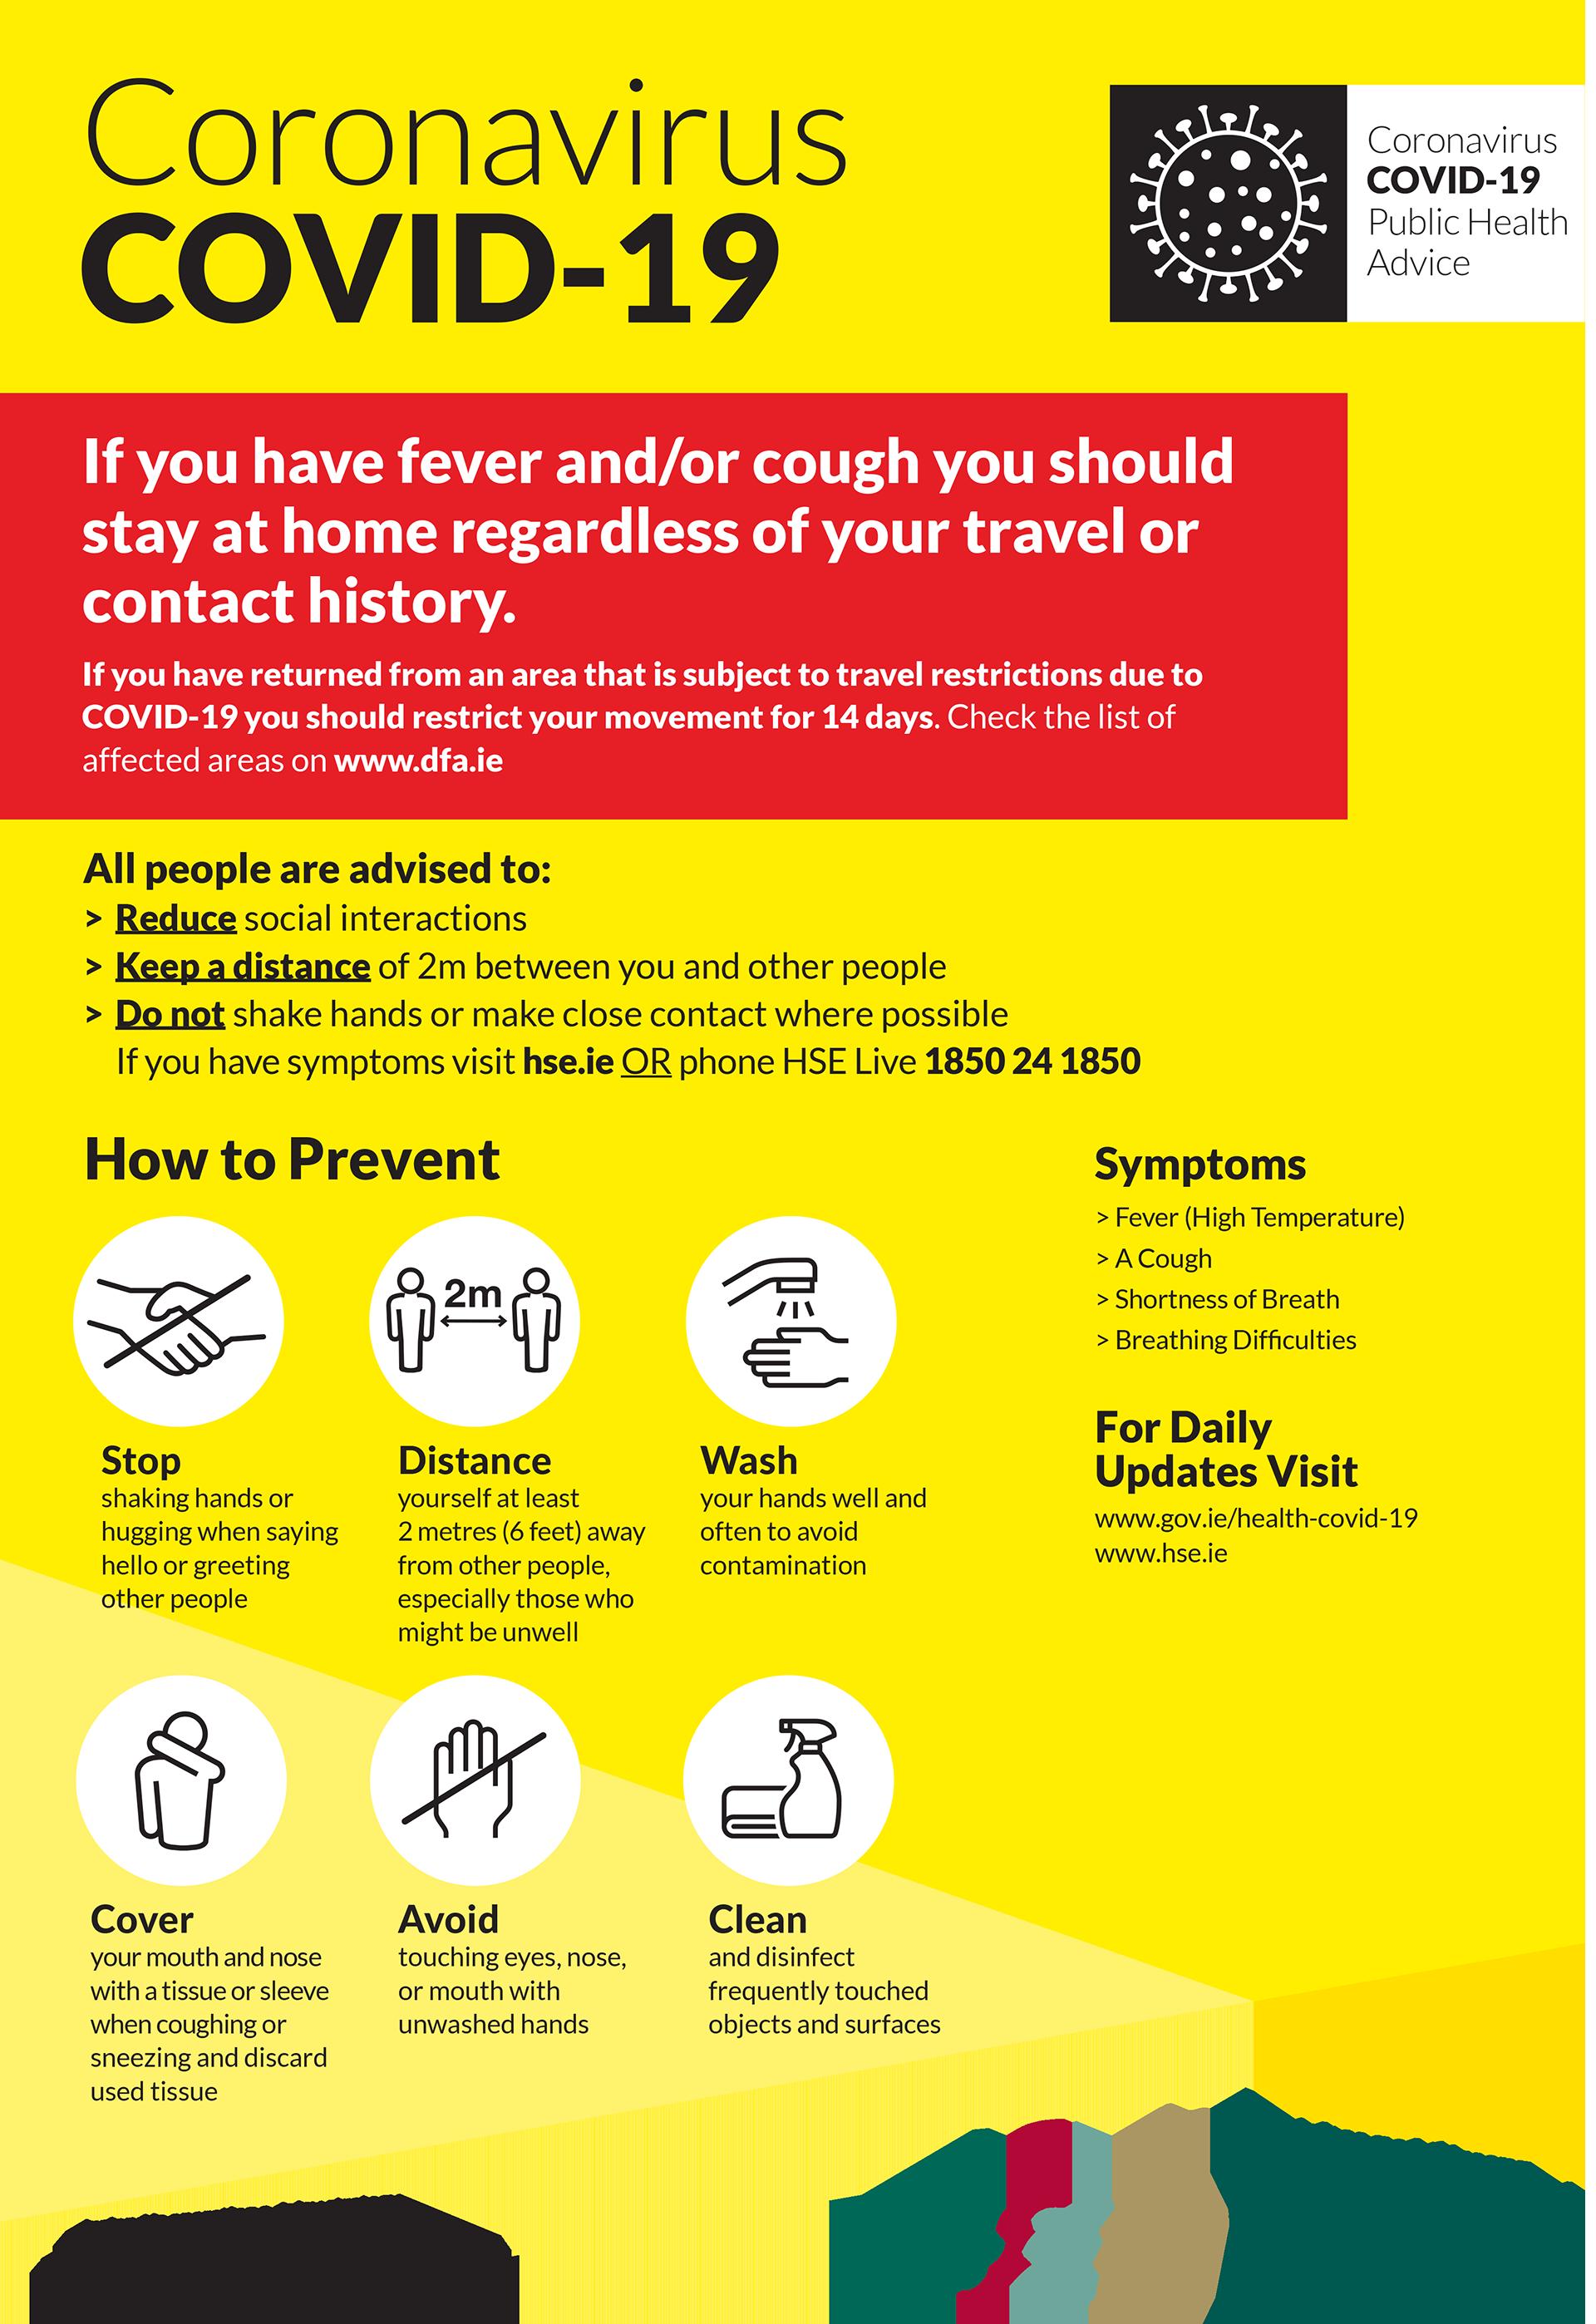 COVID-19 (Coronavirus) - HSE's Public Health Advice leaflet ...